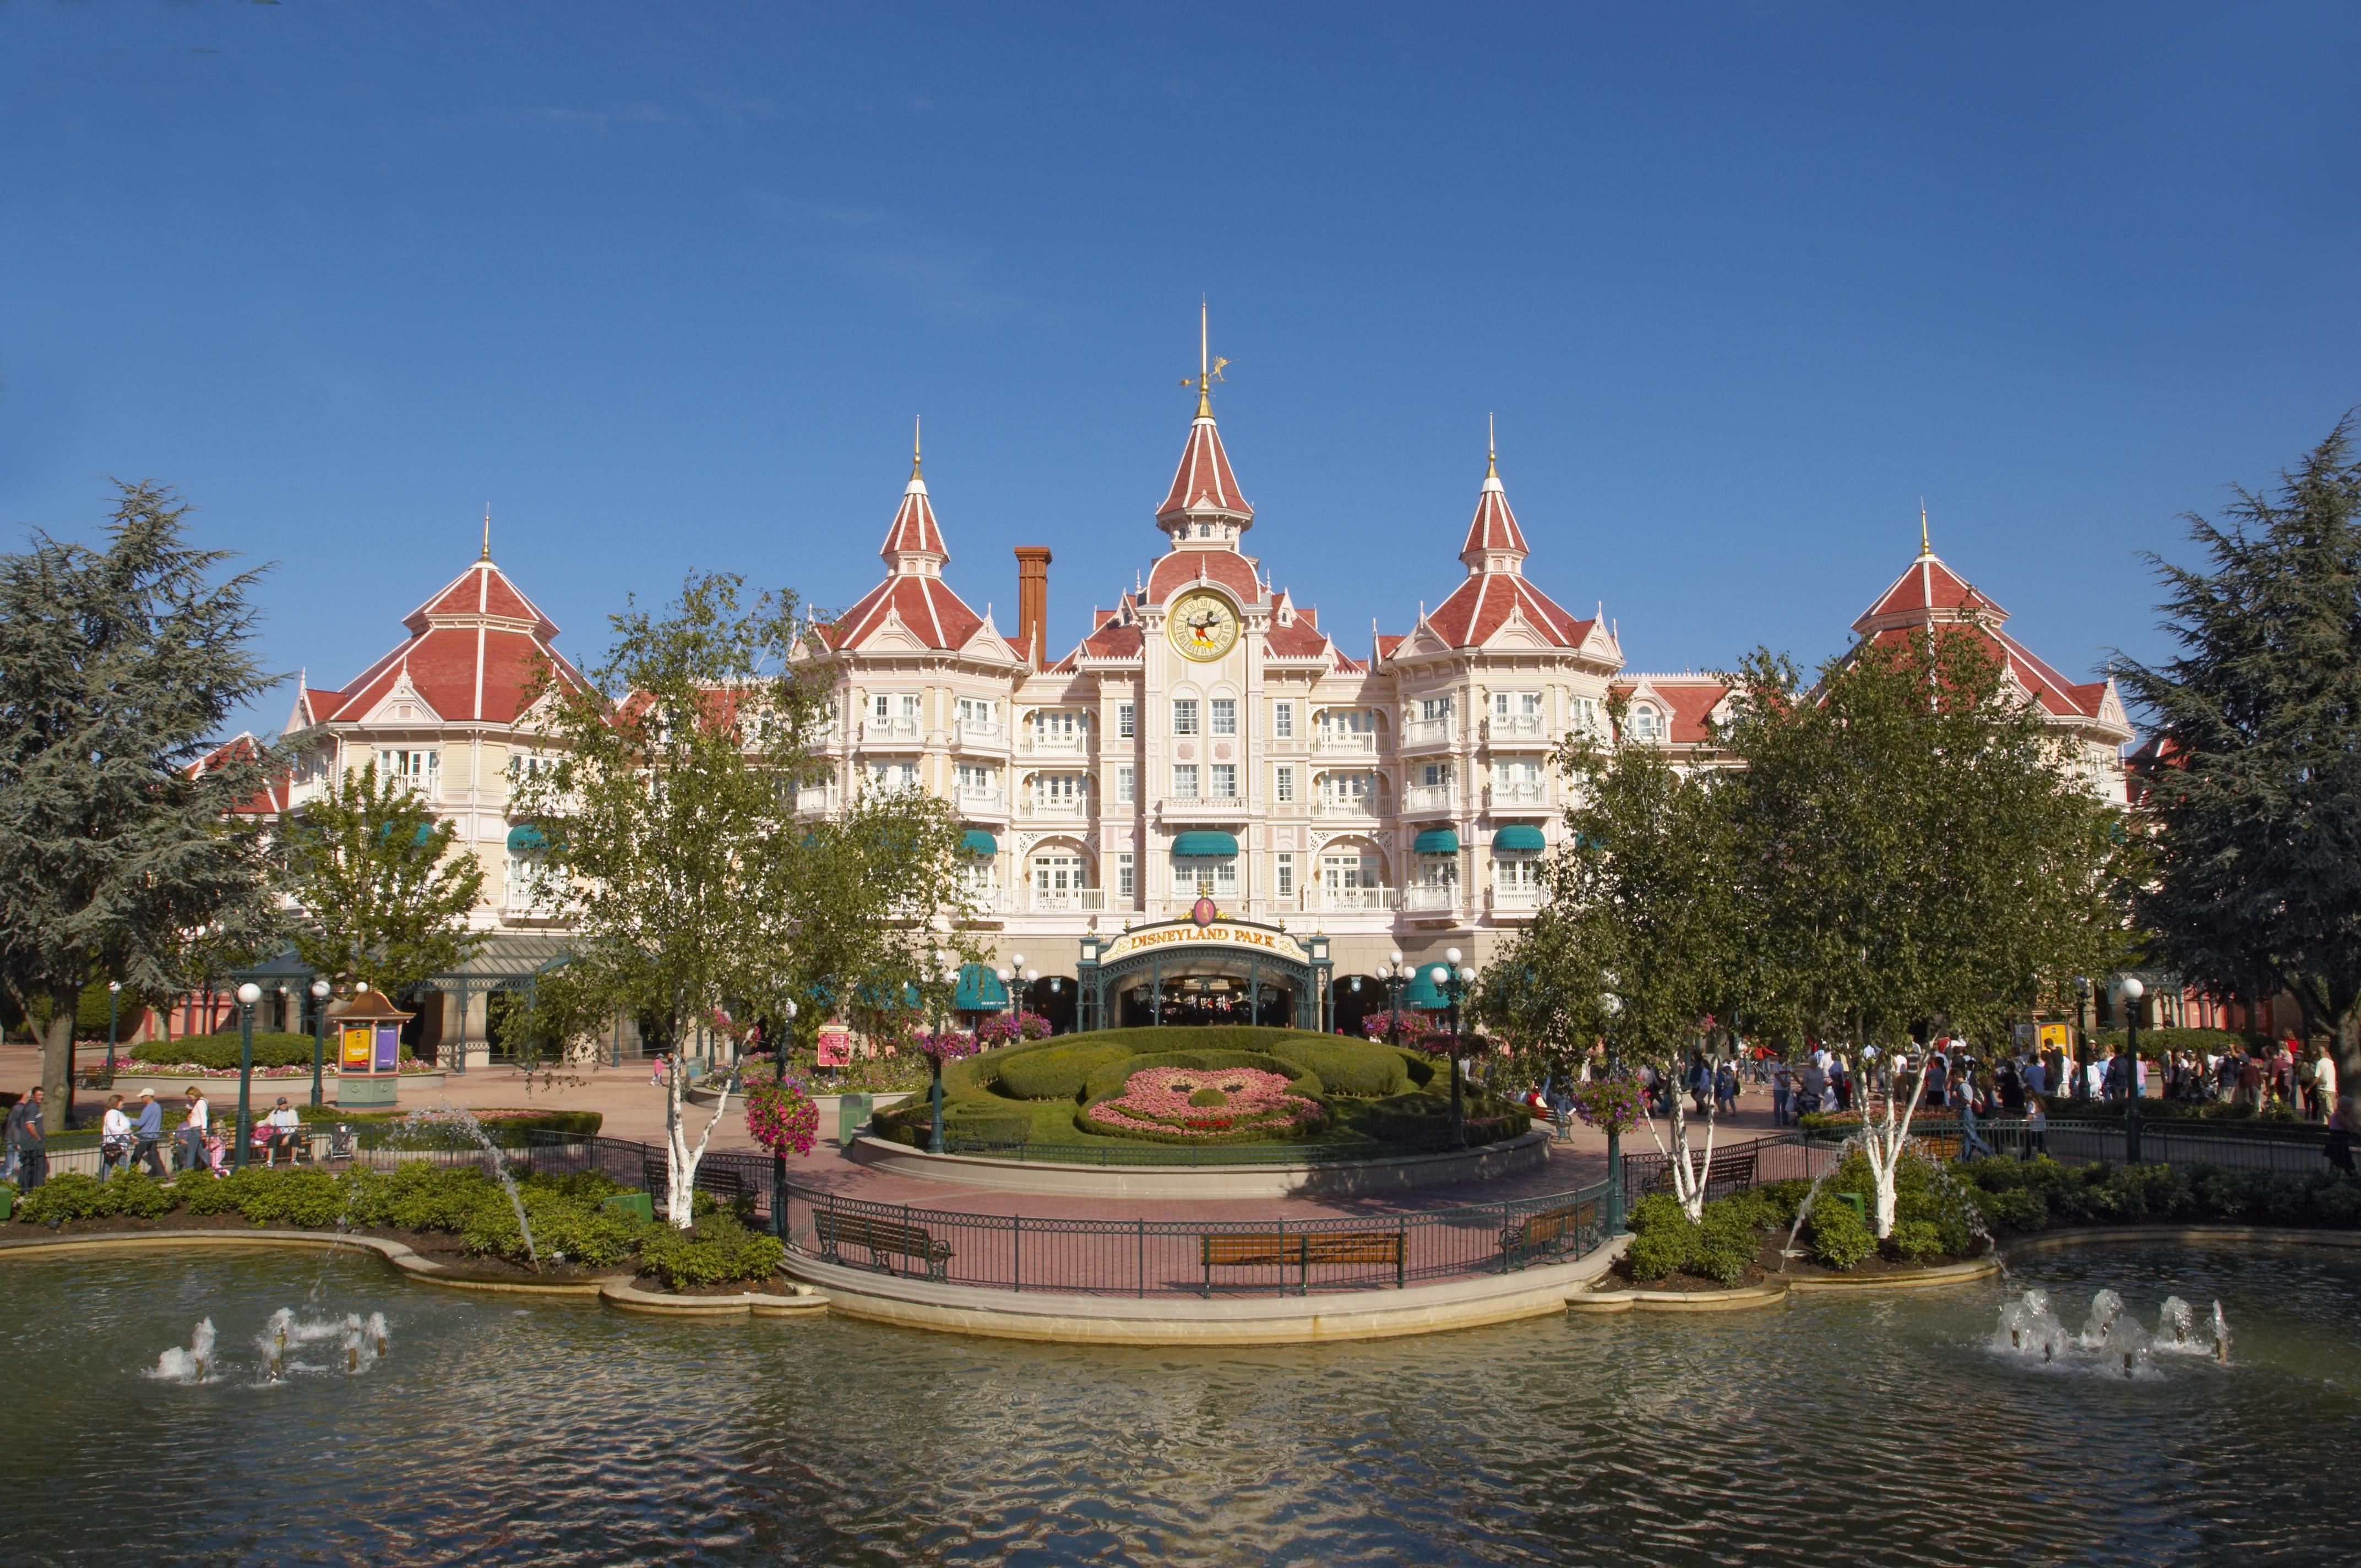 10 Reasons Why 1 Day At Disneyland Paris Isn't Enough